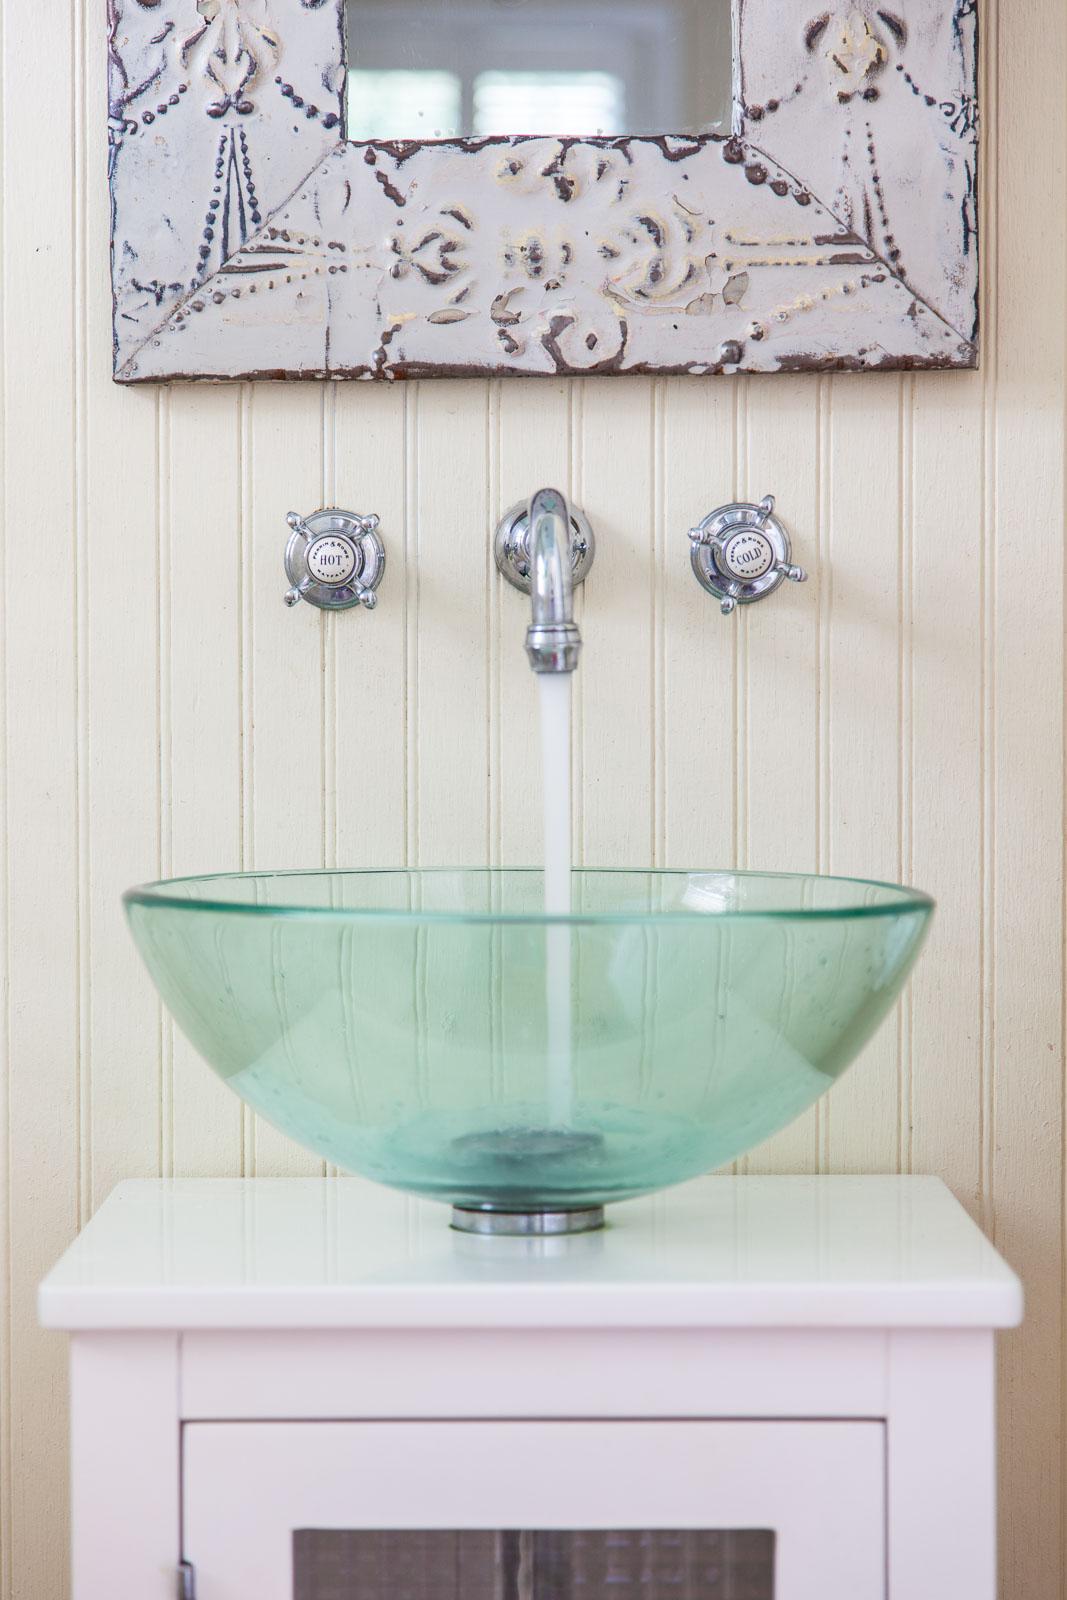 Savannah bathroom architectural photography detail